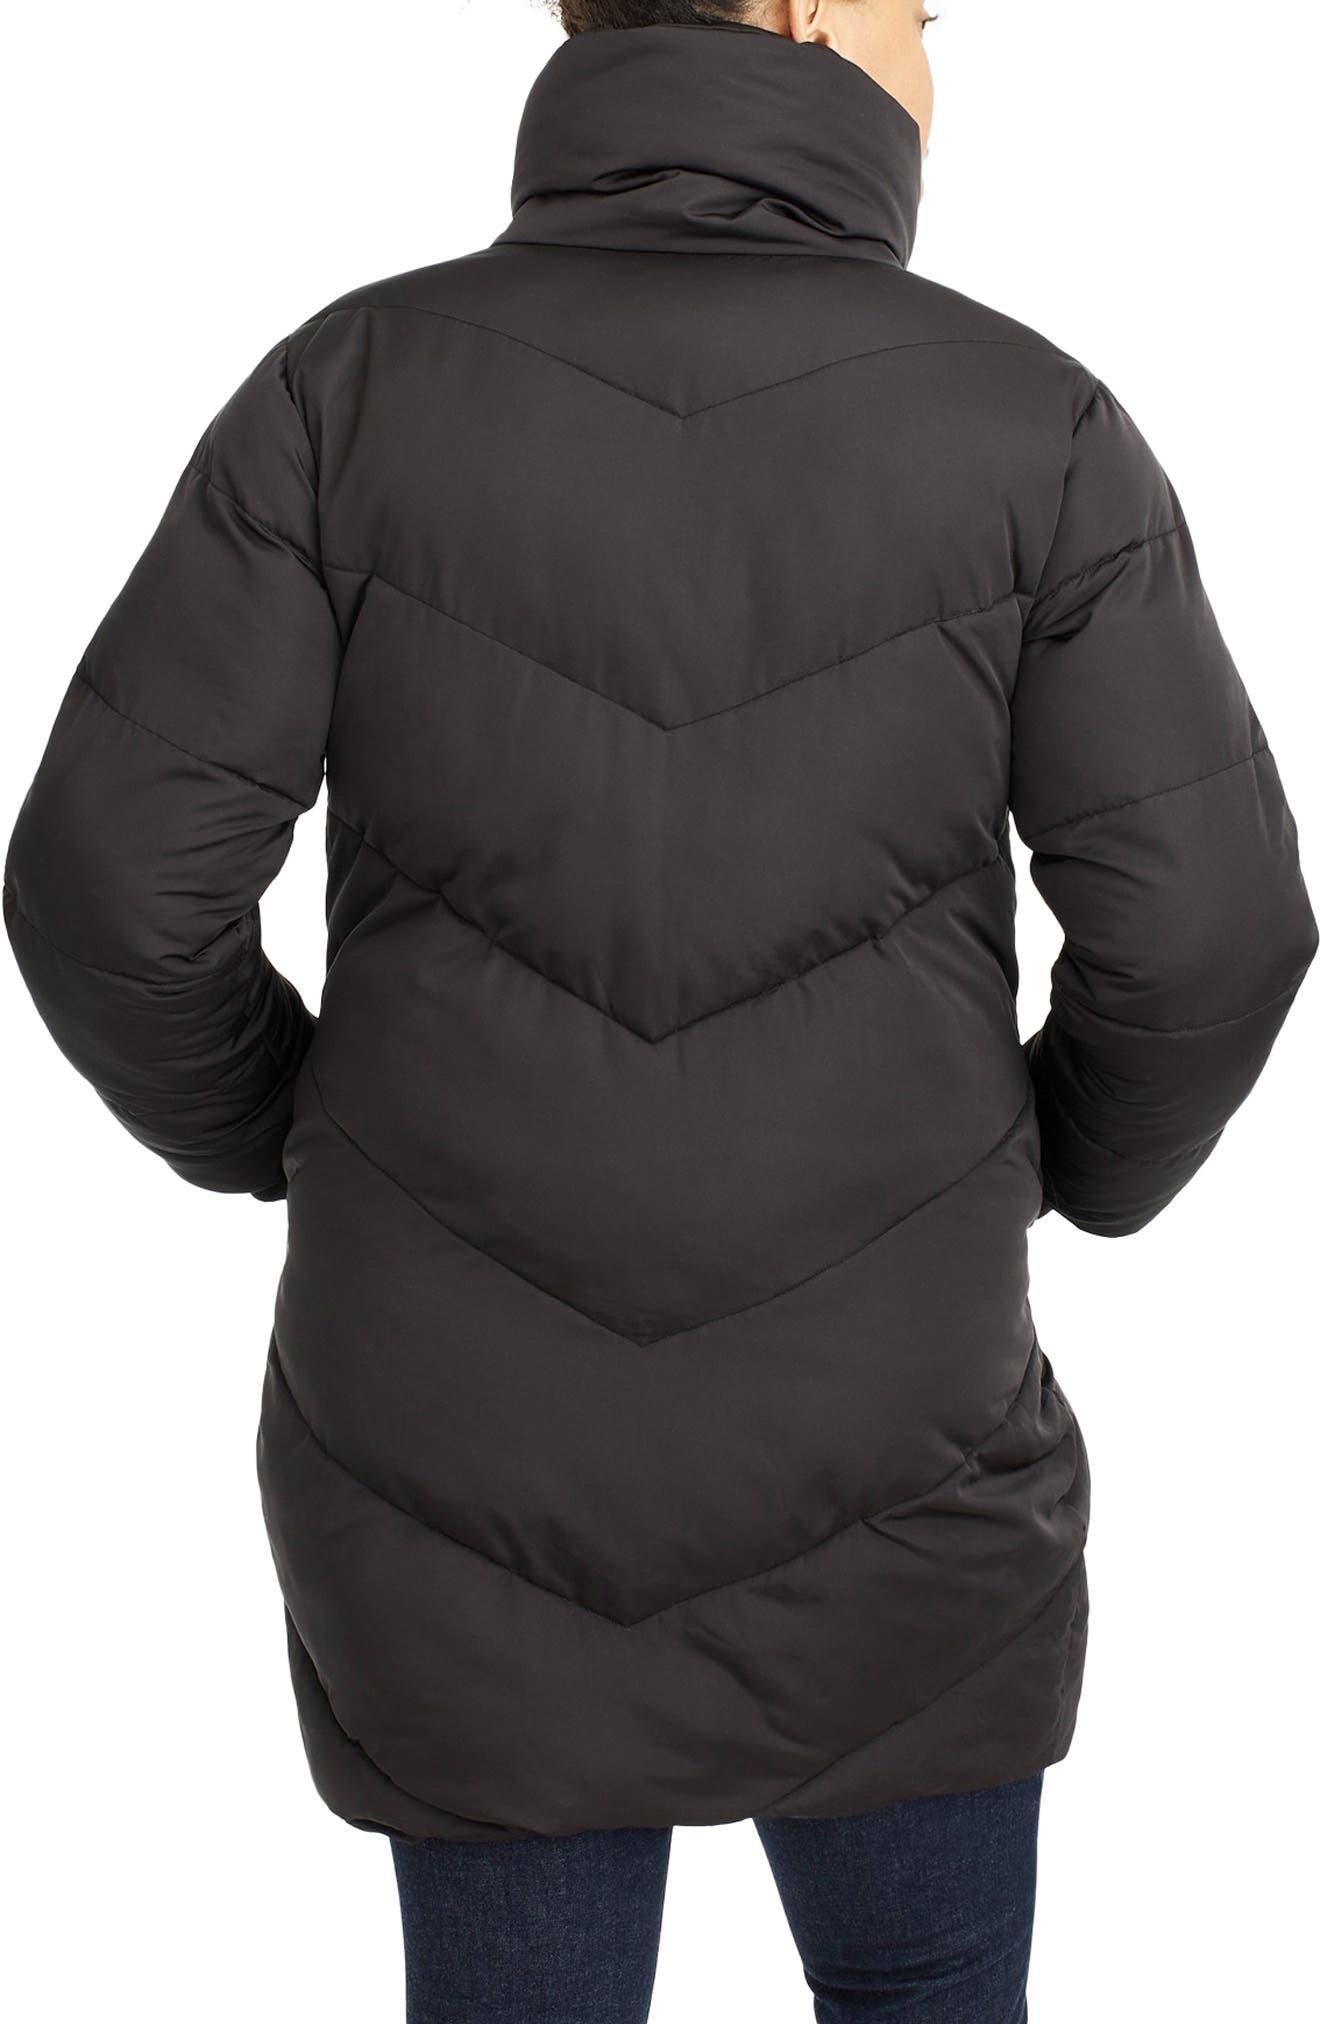 for J.Crew Chevron Long Puffer Coat,                             Alternate thumbnail 2, color,                             BLACK